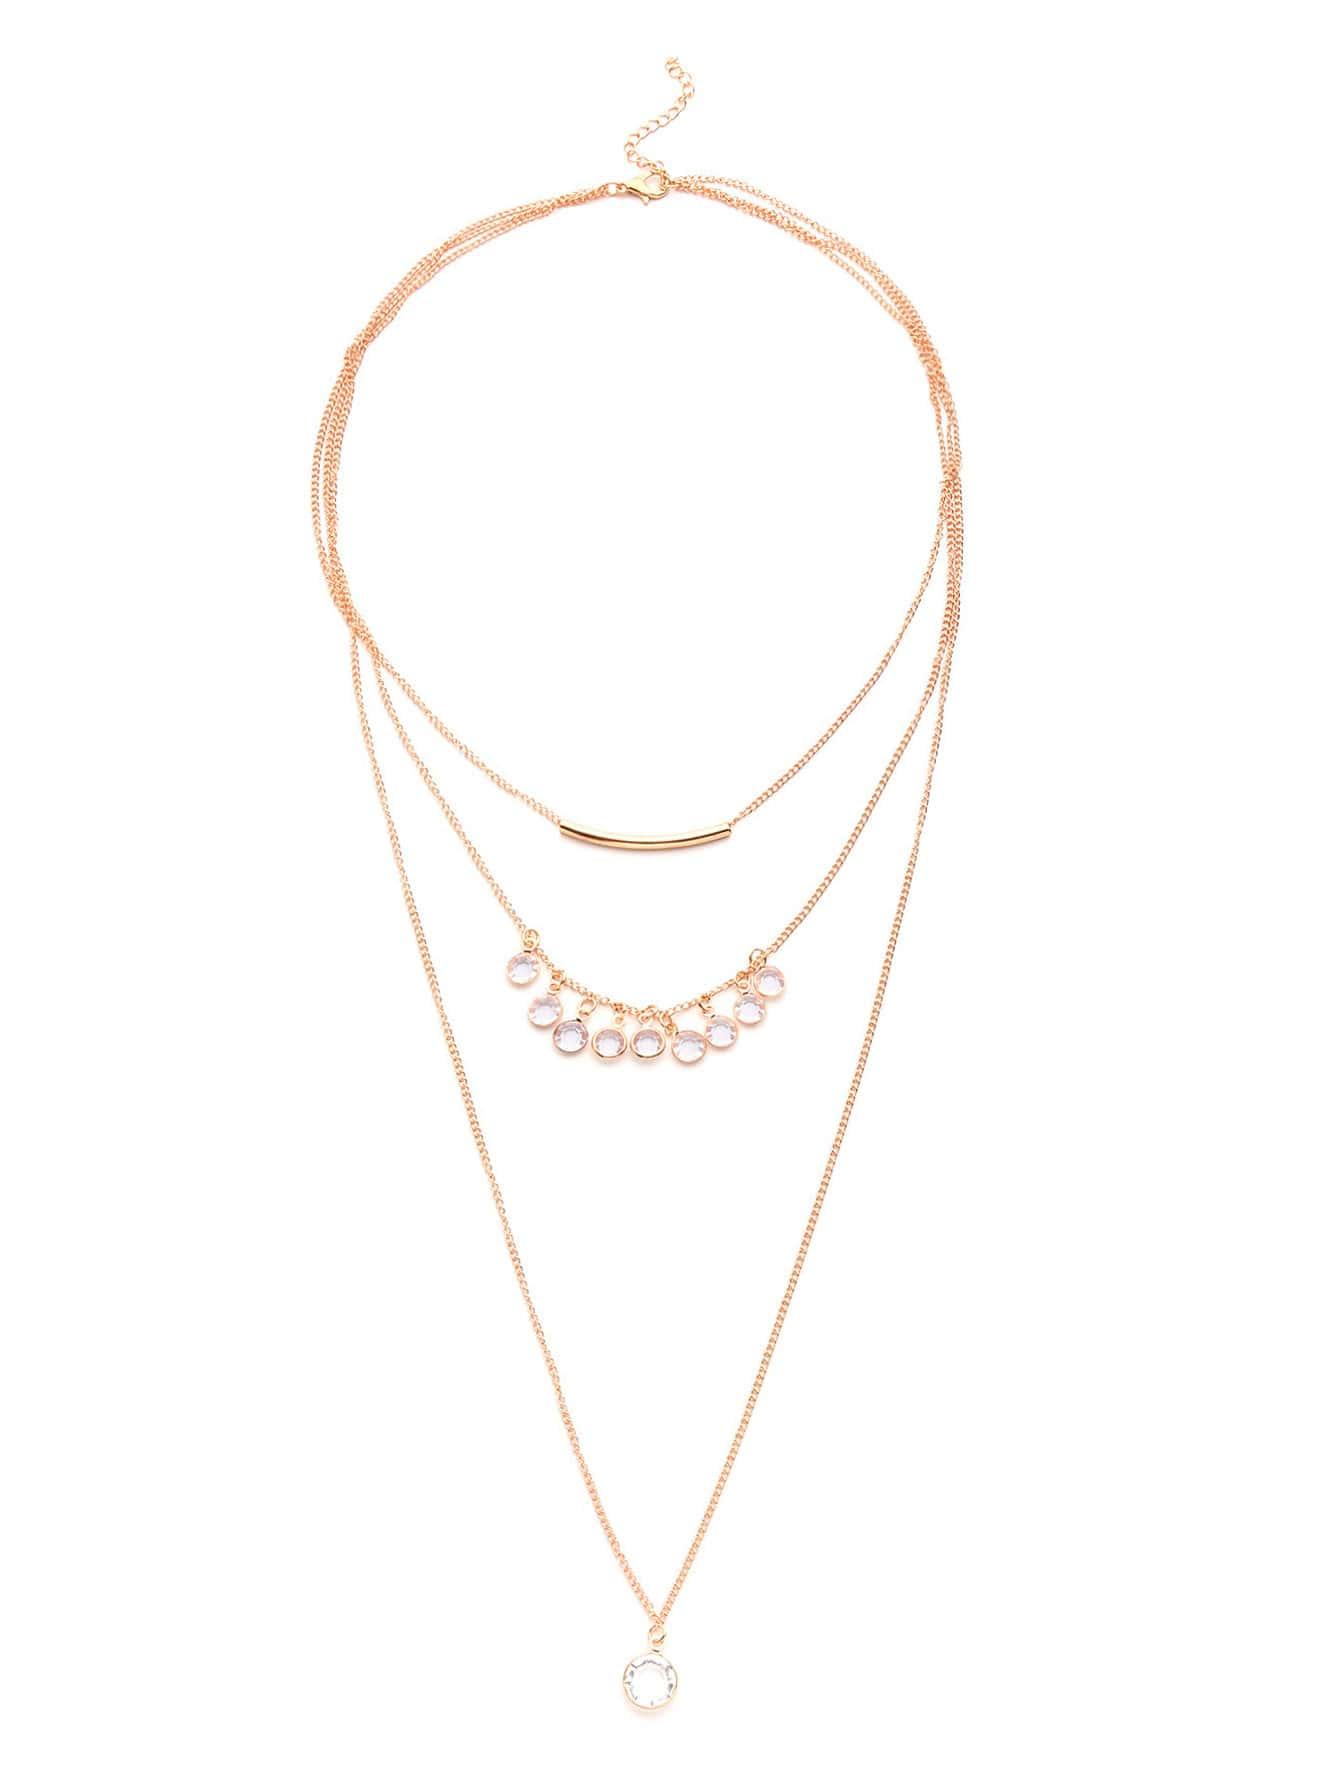 Фото Rhinestone Embellished Layered Chain Necklace. Купить с доставкой